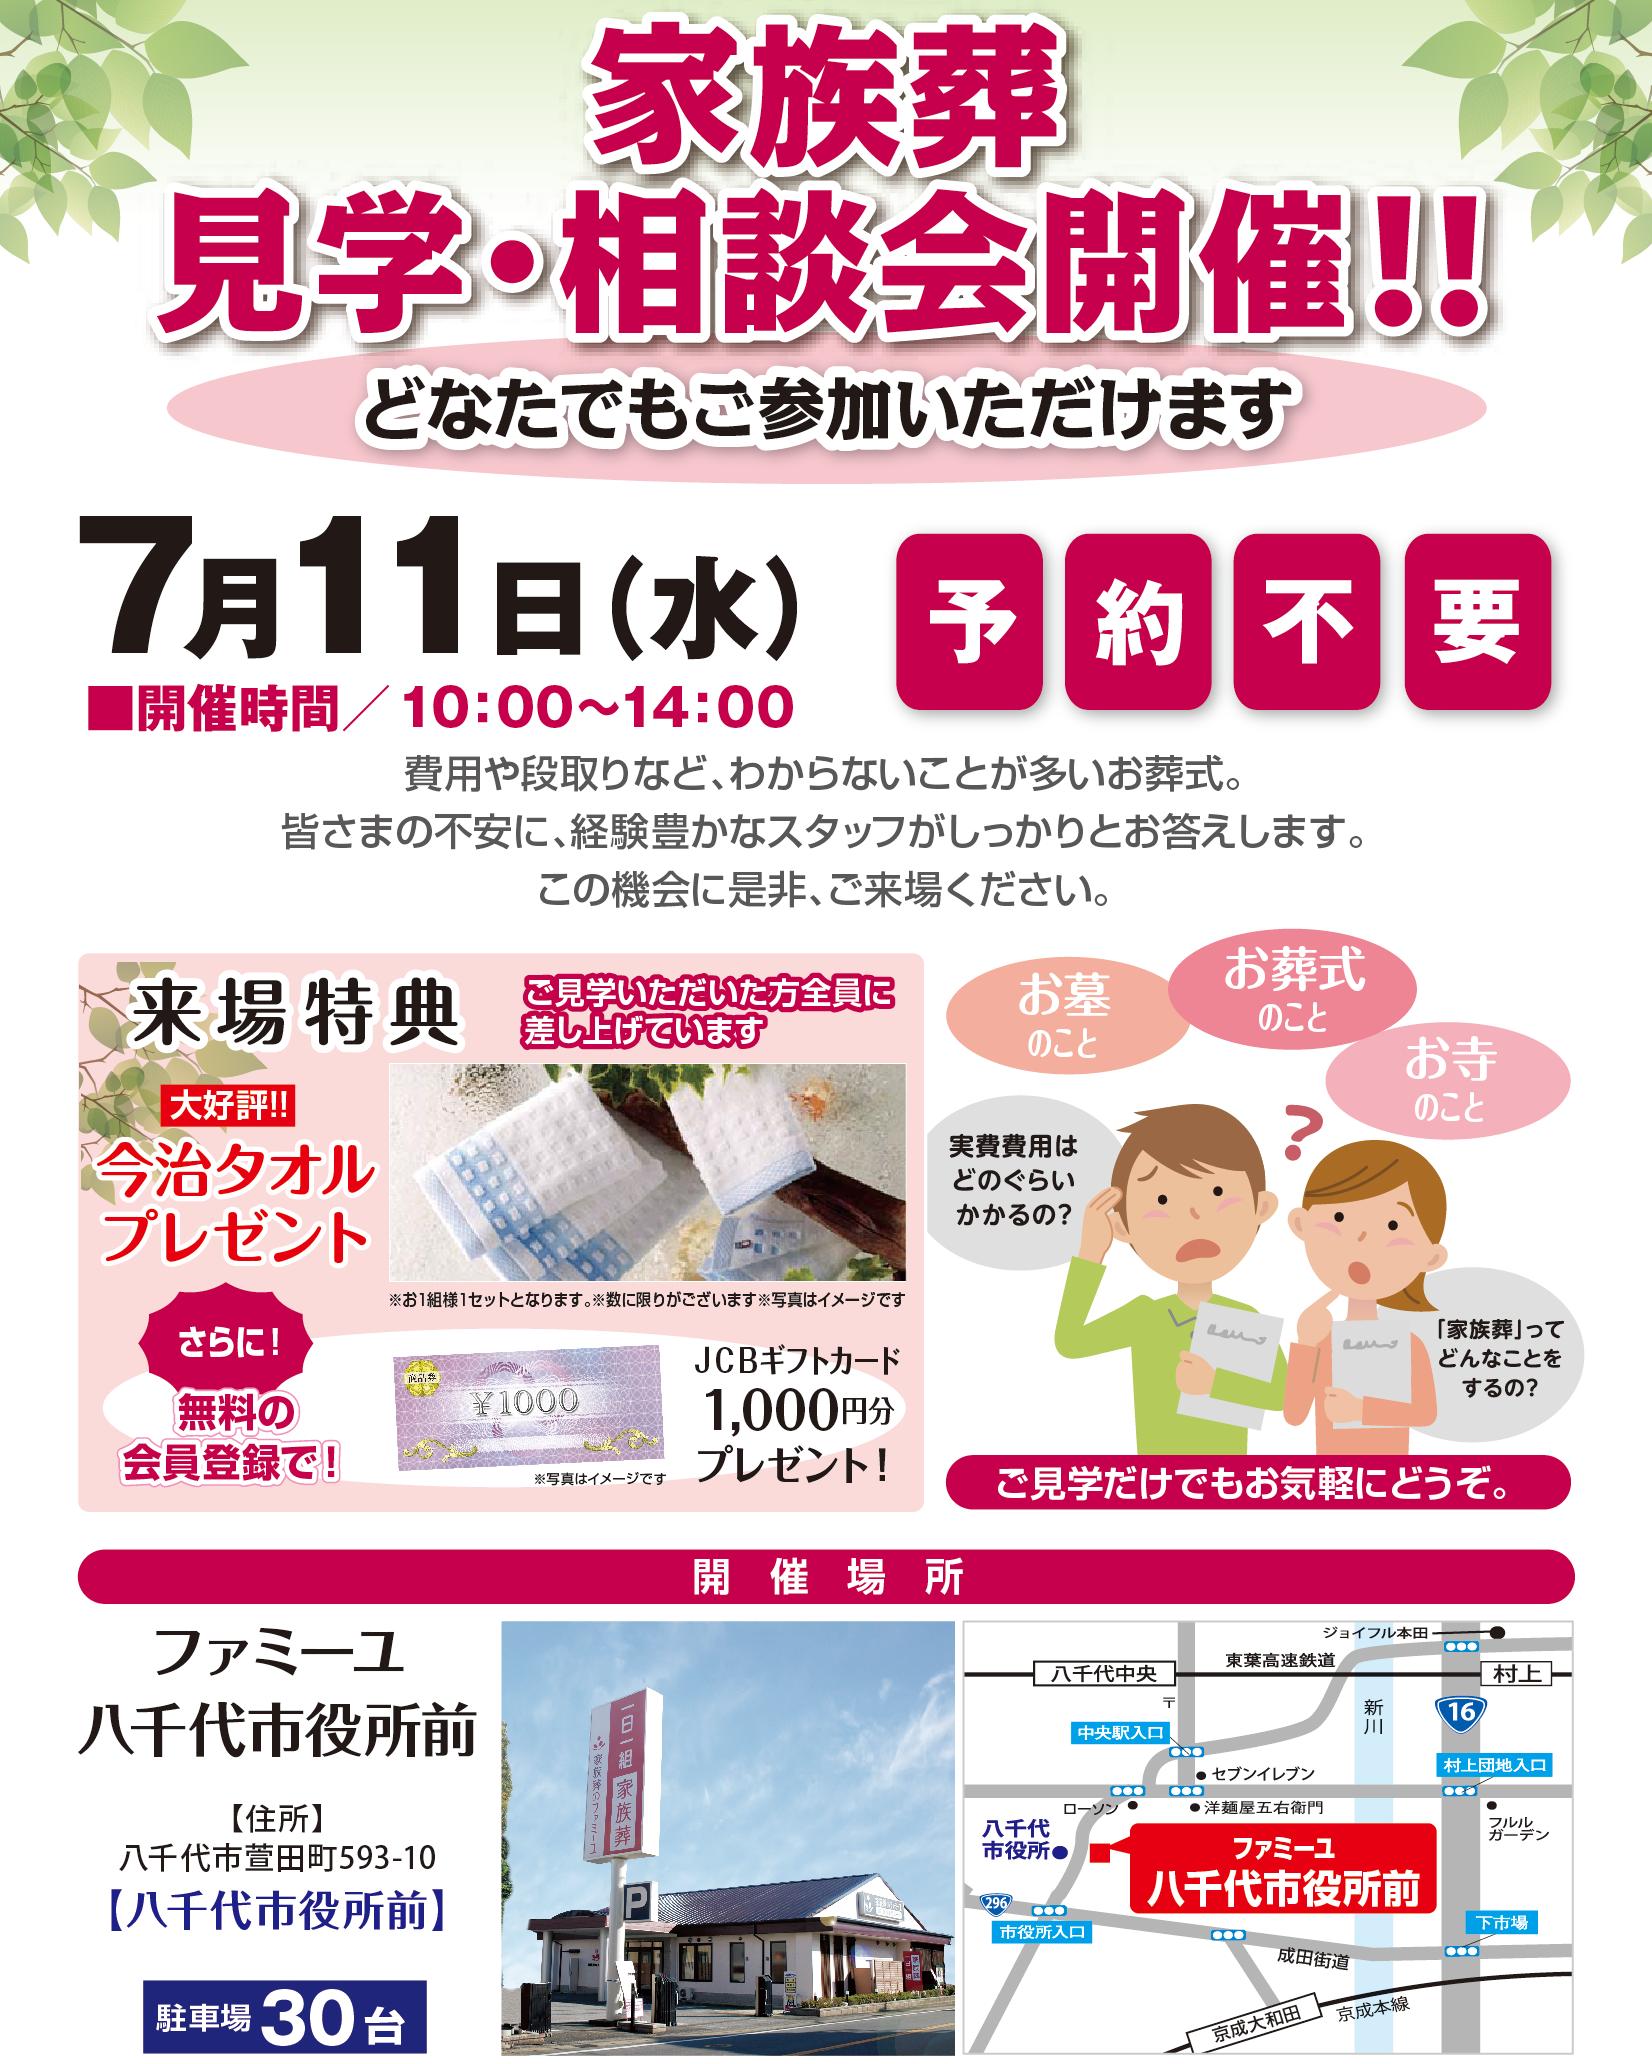 https://www.famille-kazokusou.com/news/kengakuchirashi_yachiyo.png